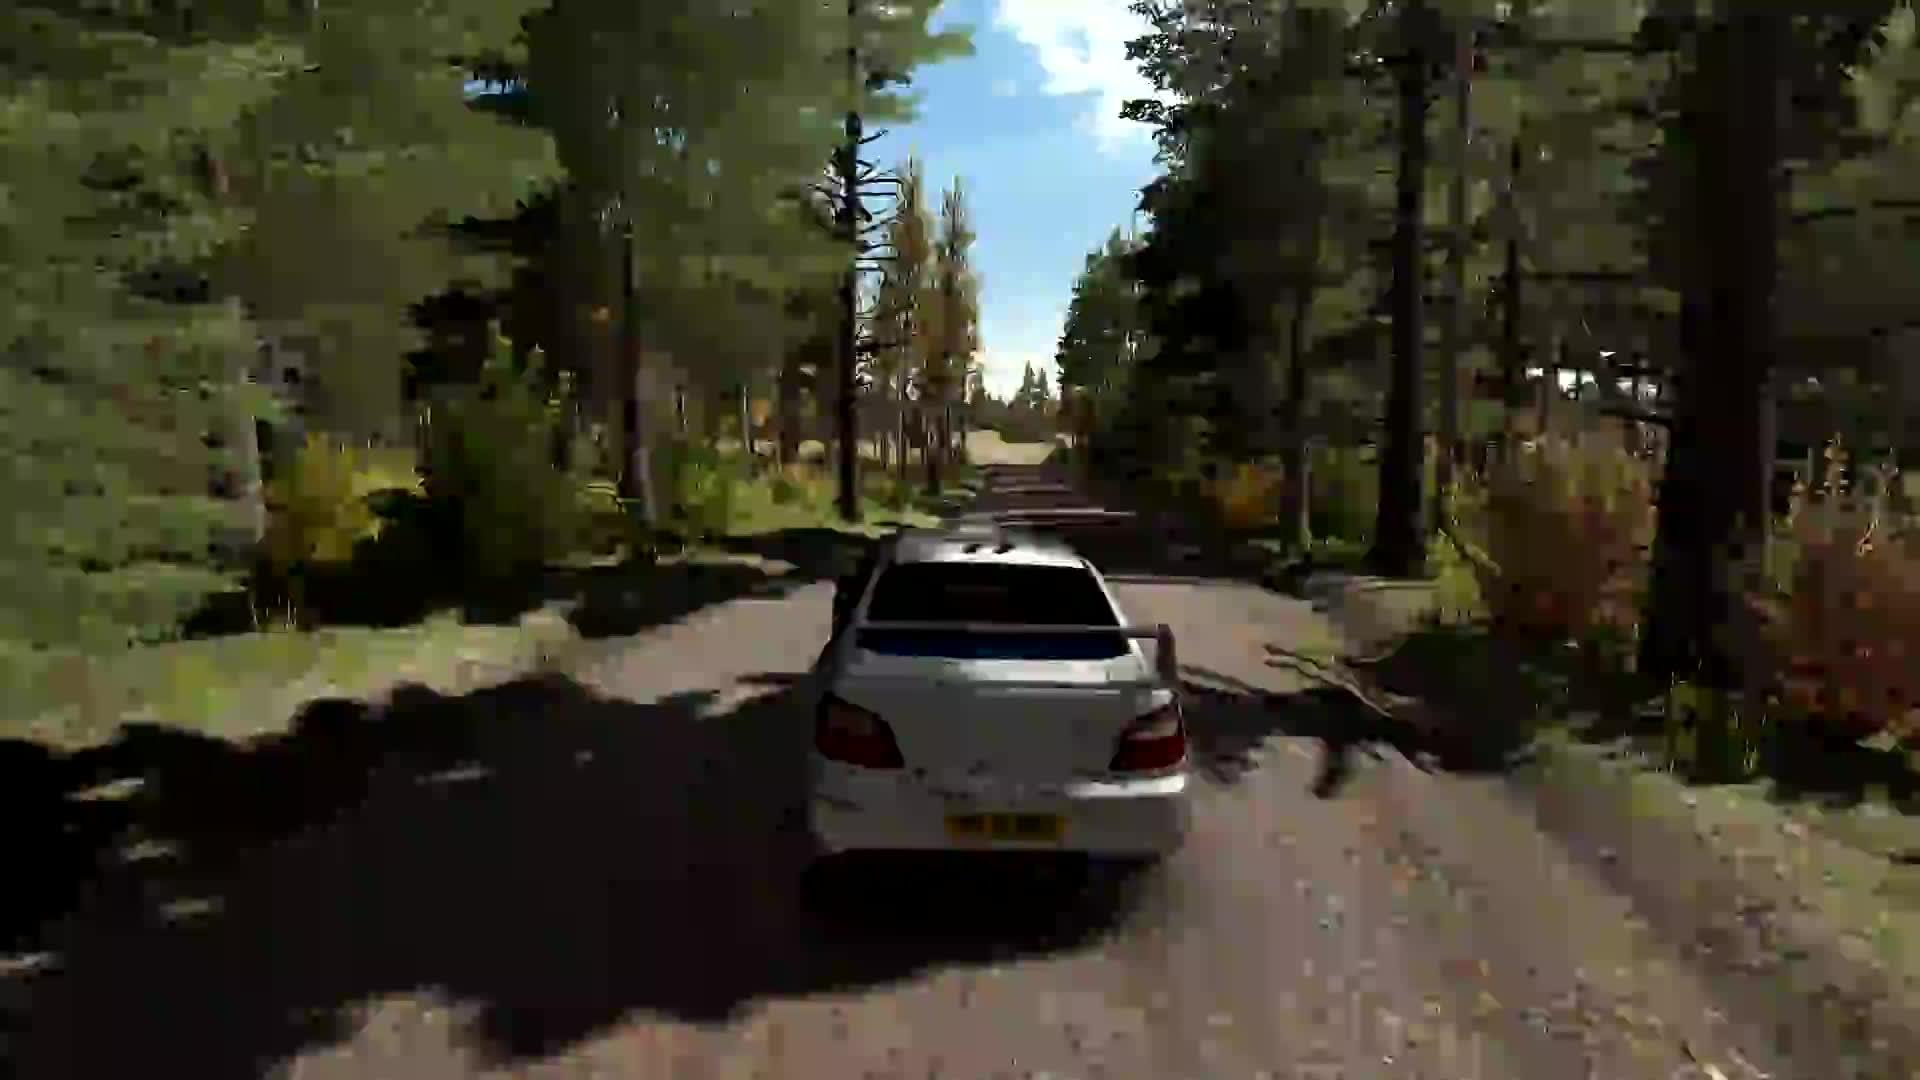 DR - Subaru, uh - finds a way GIFs